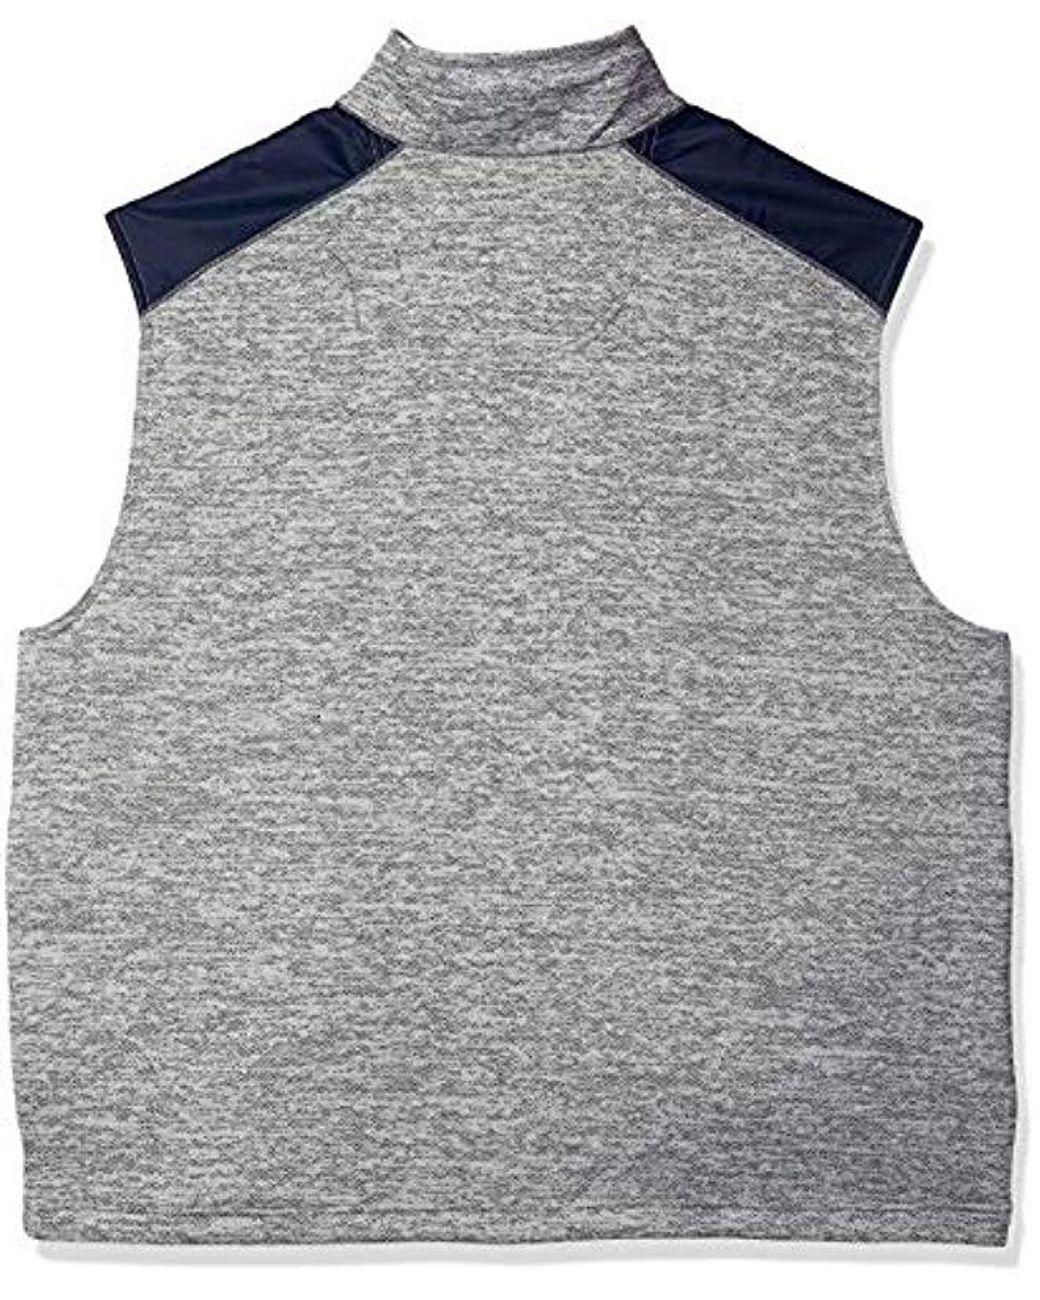 Izod Men/'s Big and Tall Spectator Fleece Jacket